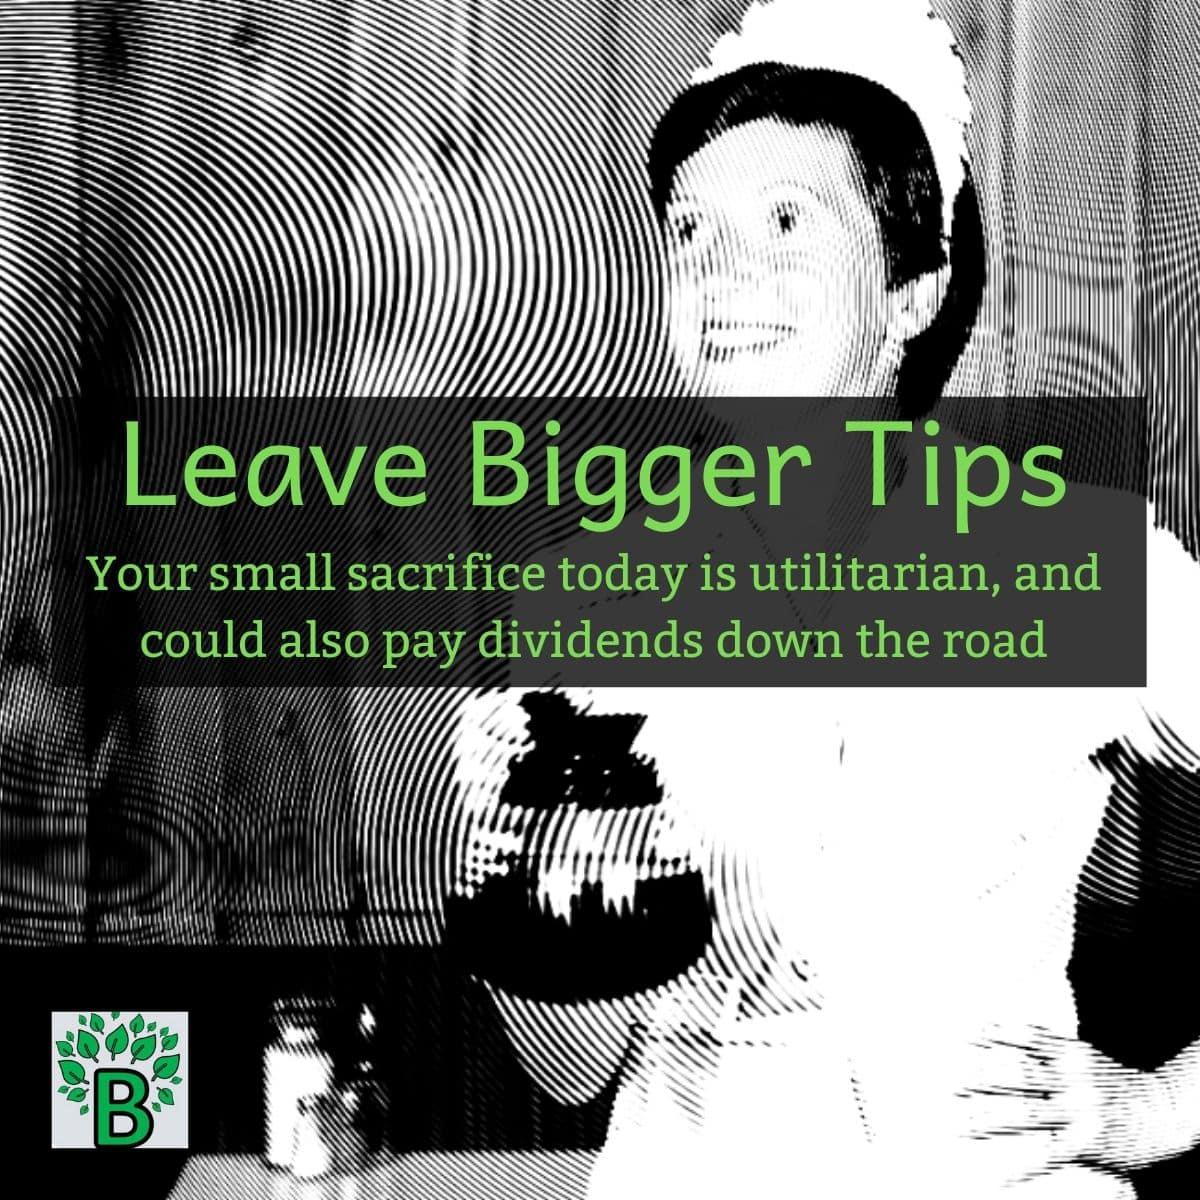 Leave bigger tips